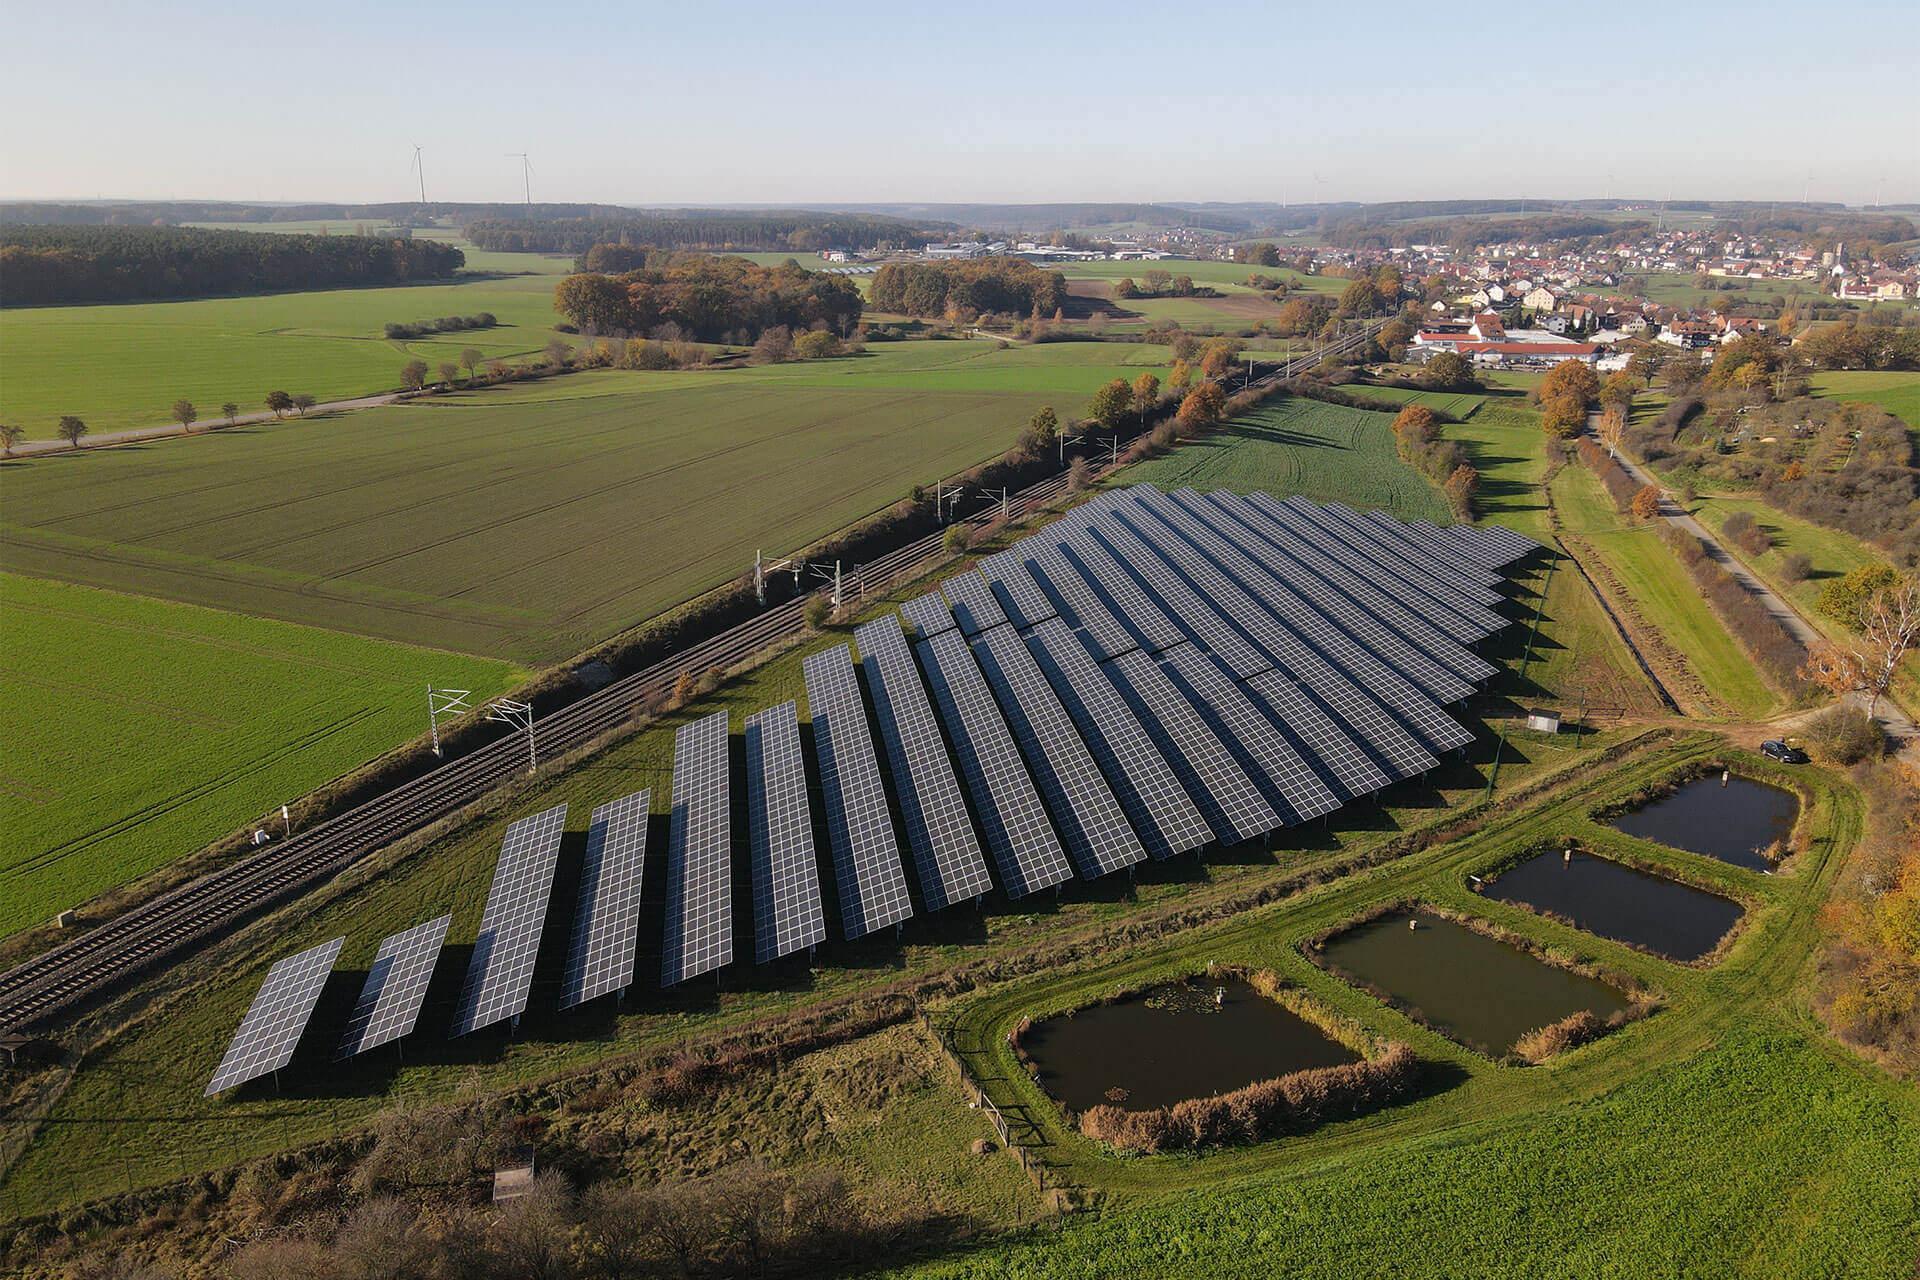 Solarpark Veitsbronn